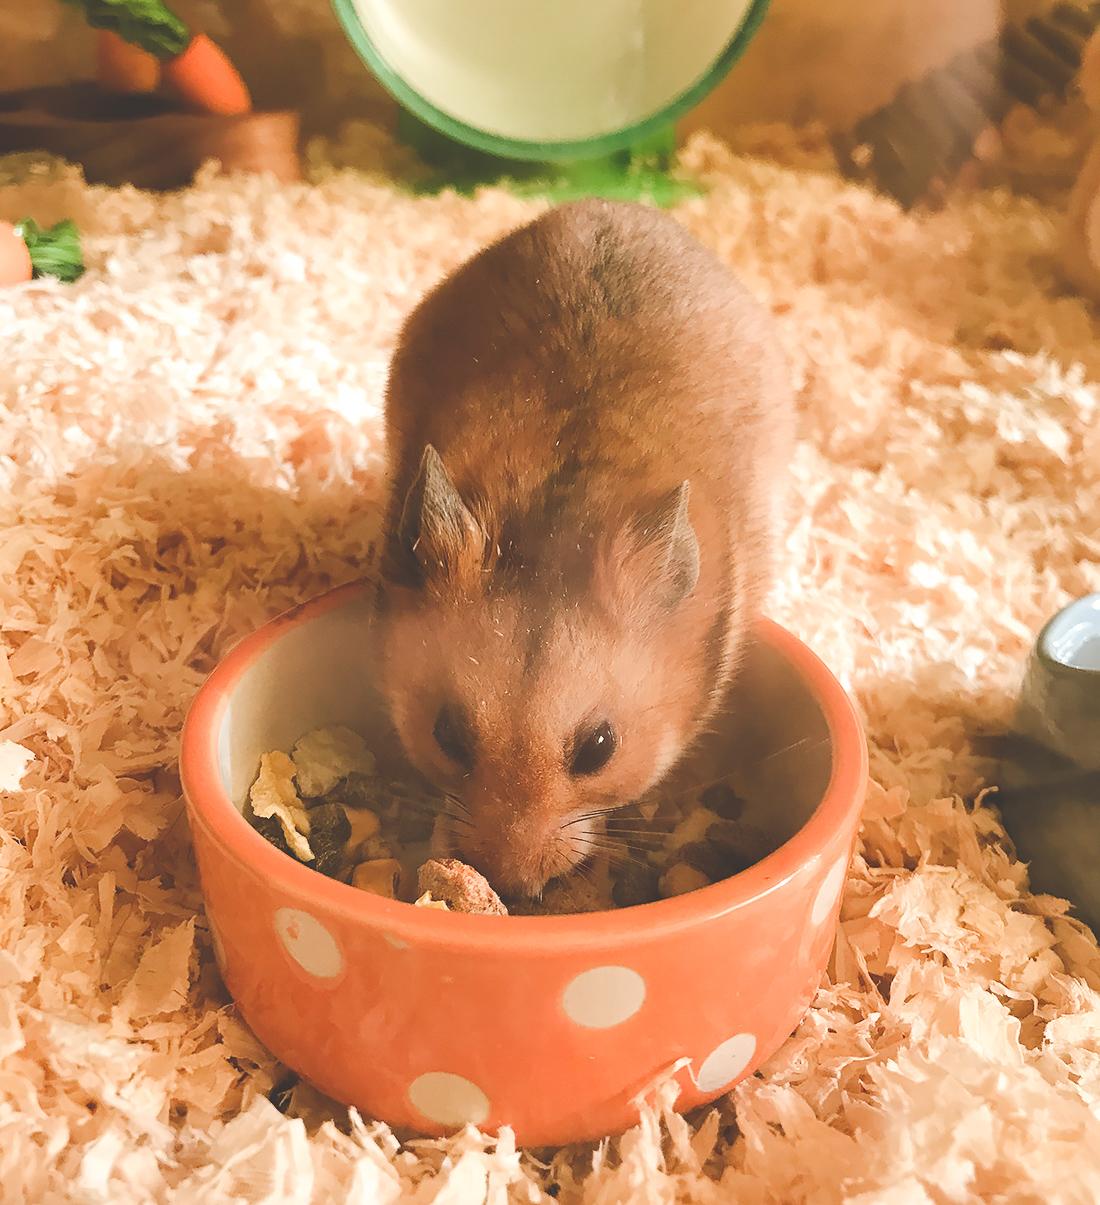 Meet Cinnamon Roll, my baby hamster | Shoes & Glitter